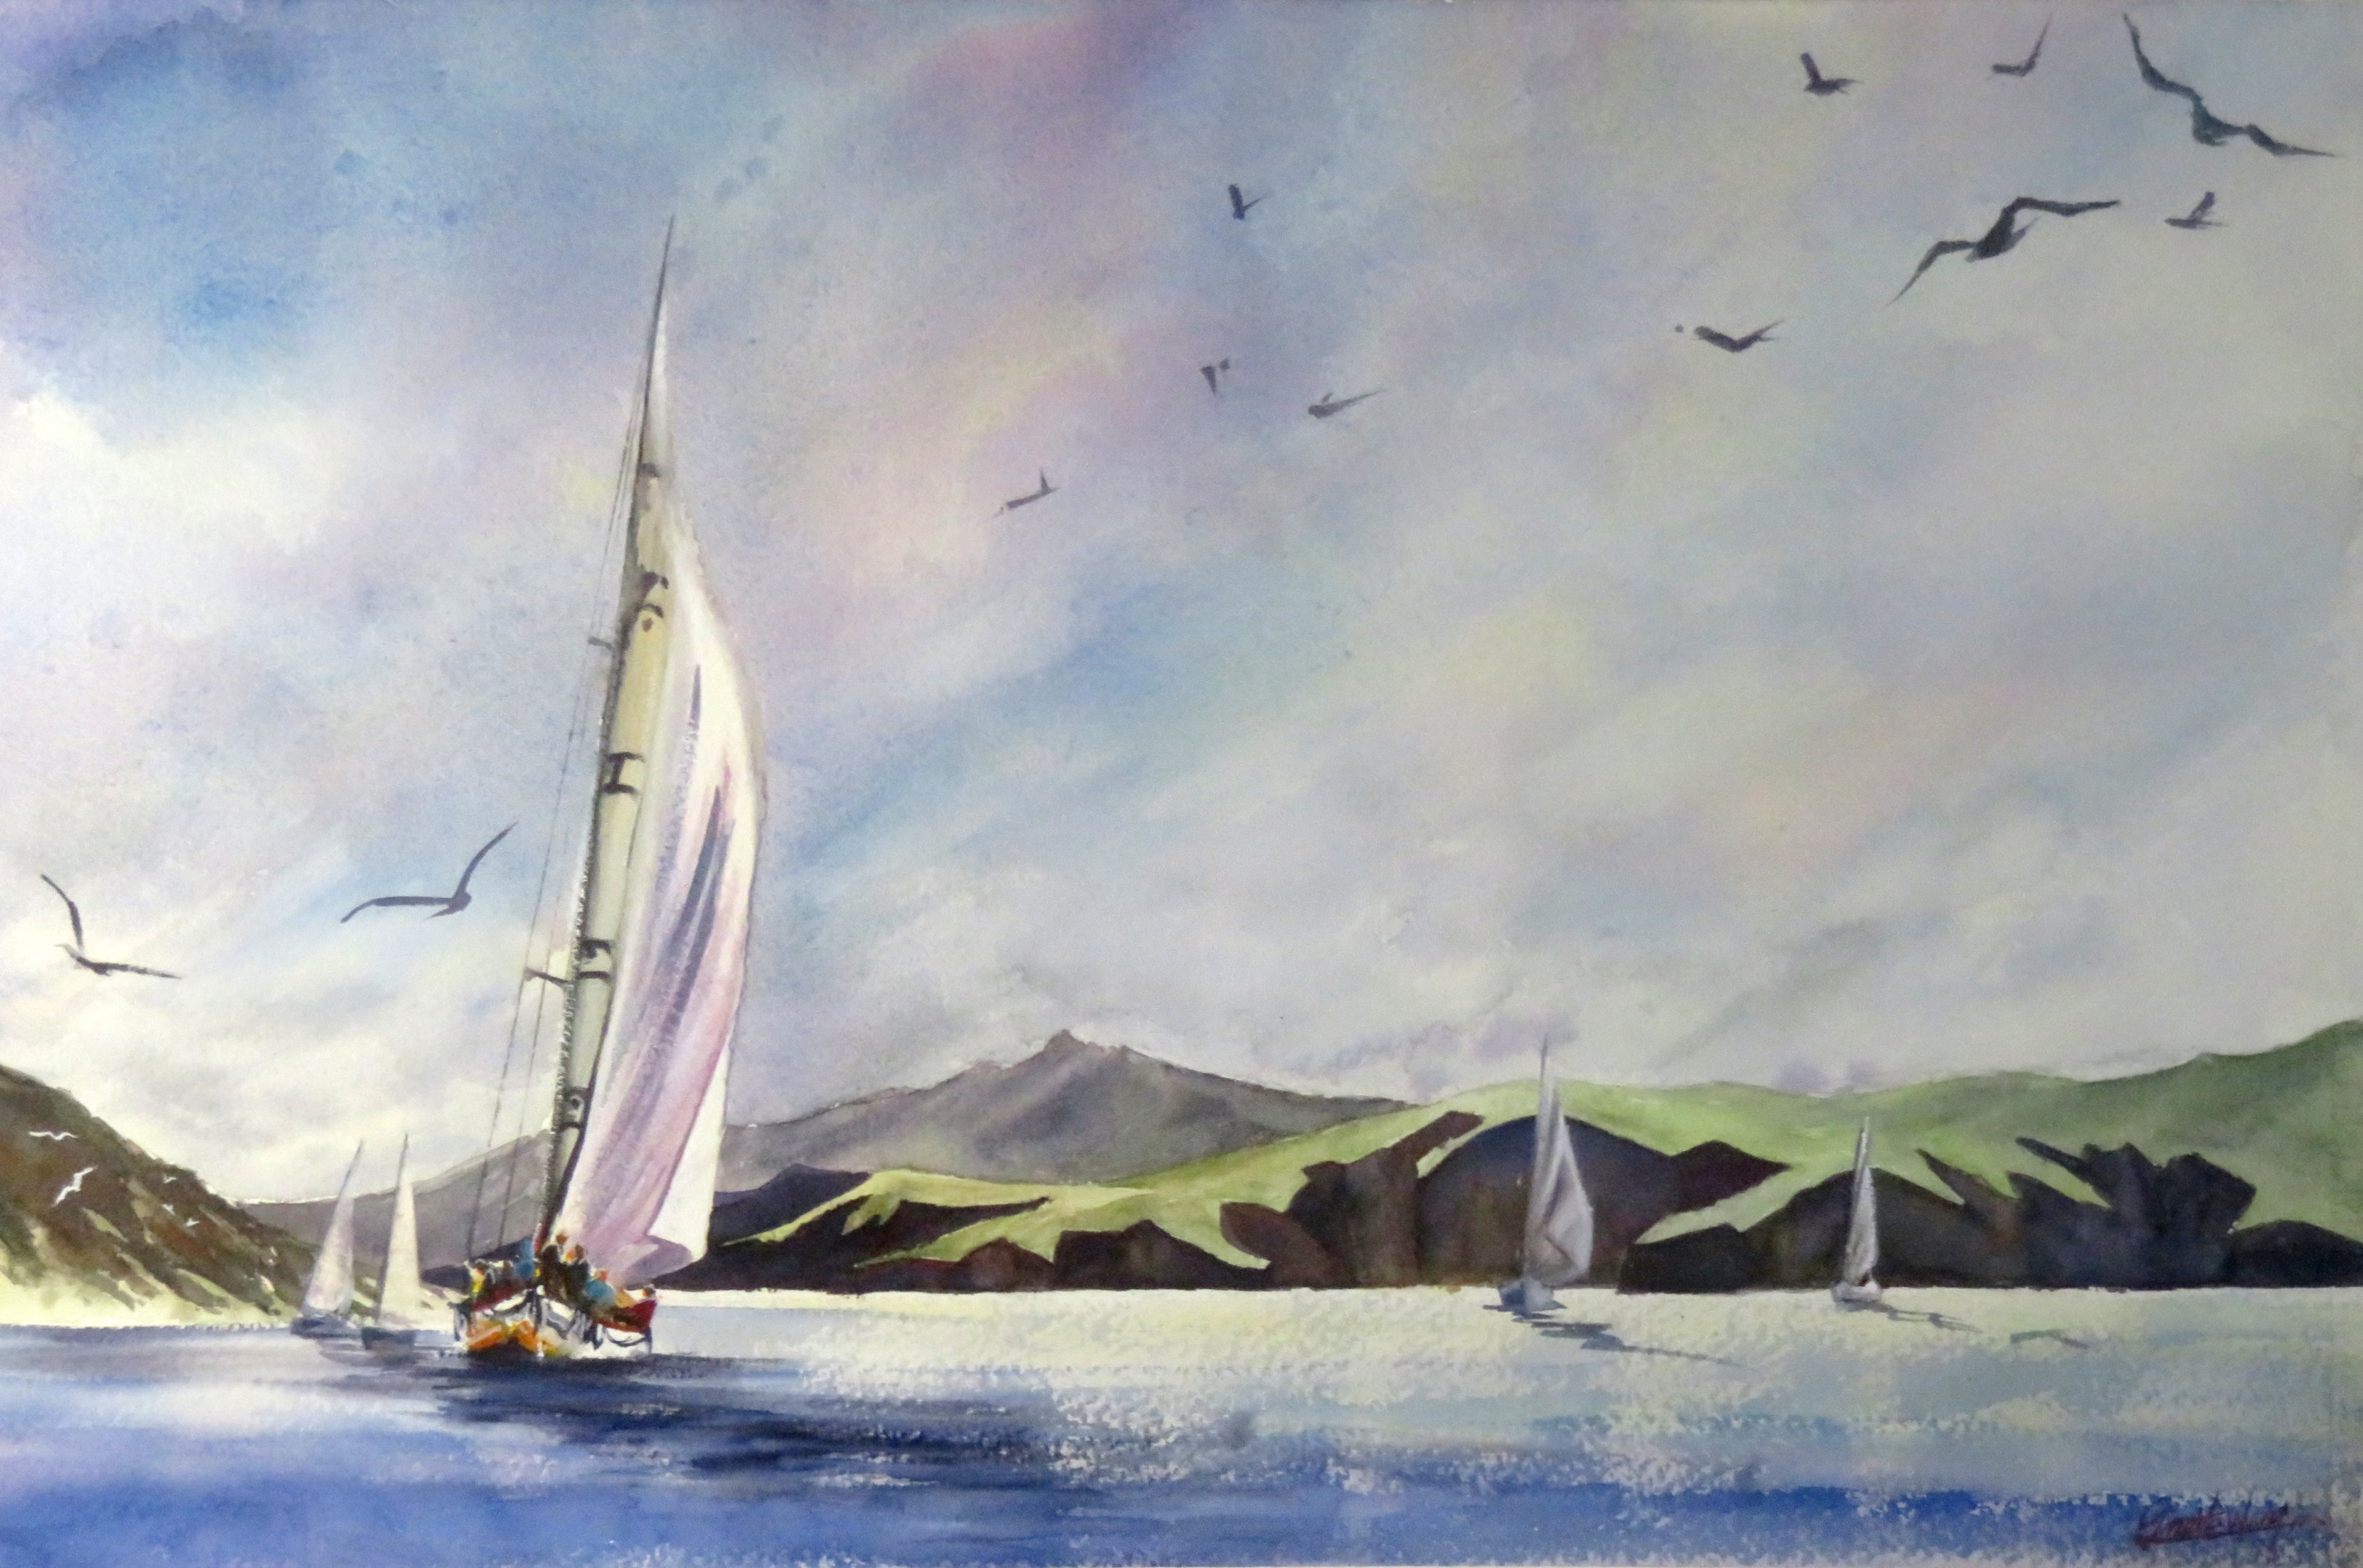 Sailing in Auckland